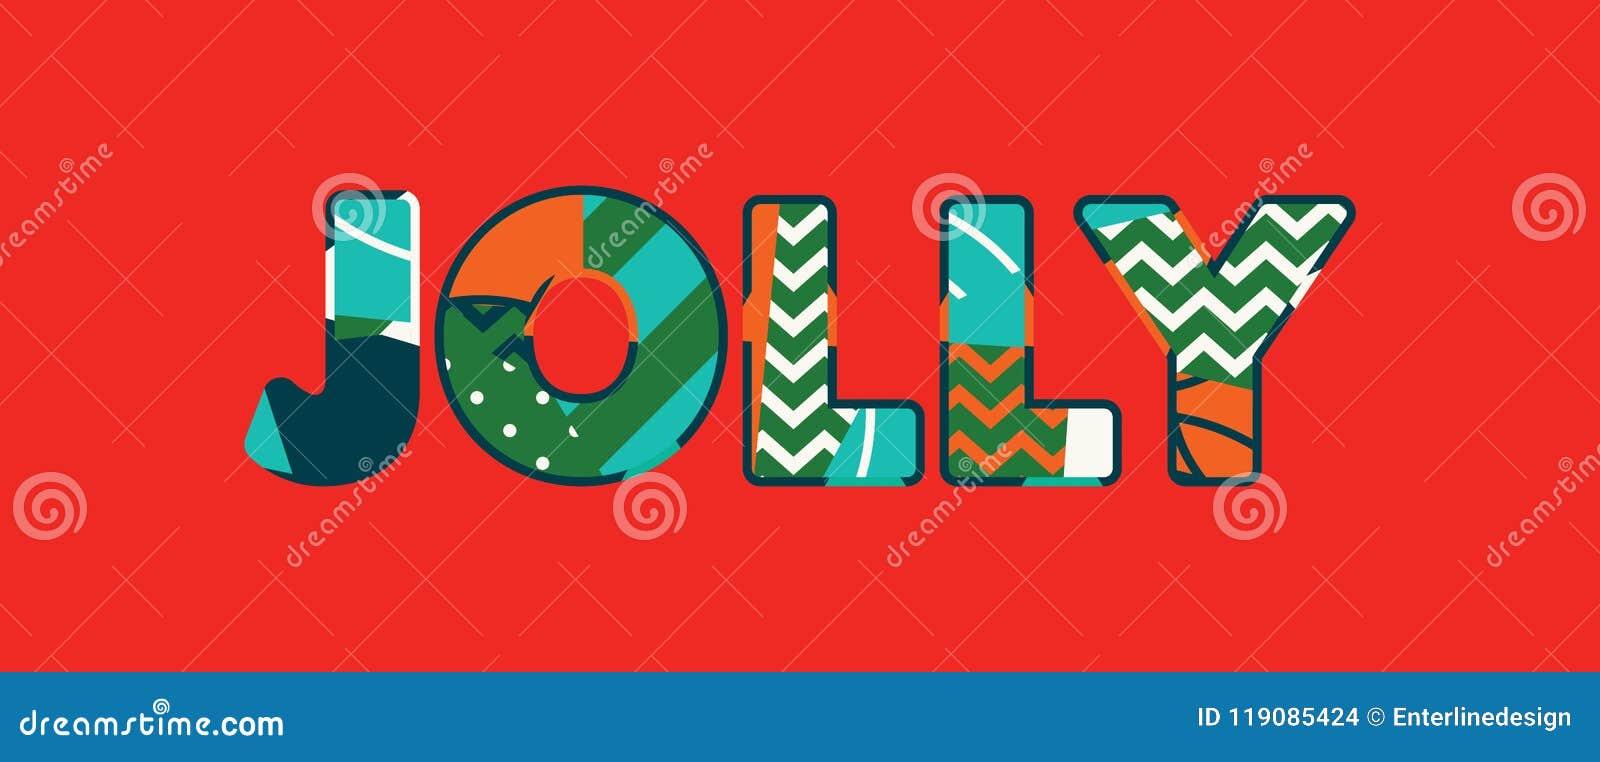 jolly concept word art illustration stock vector illustration of